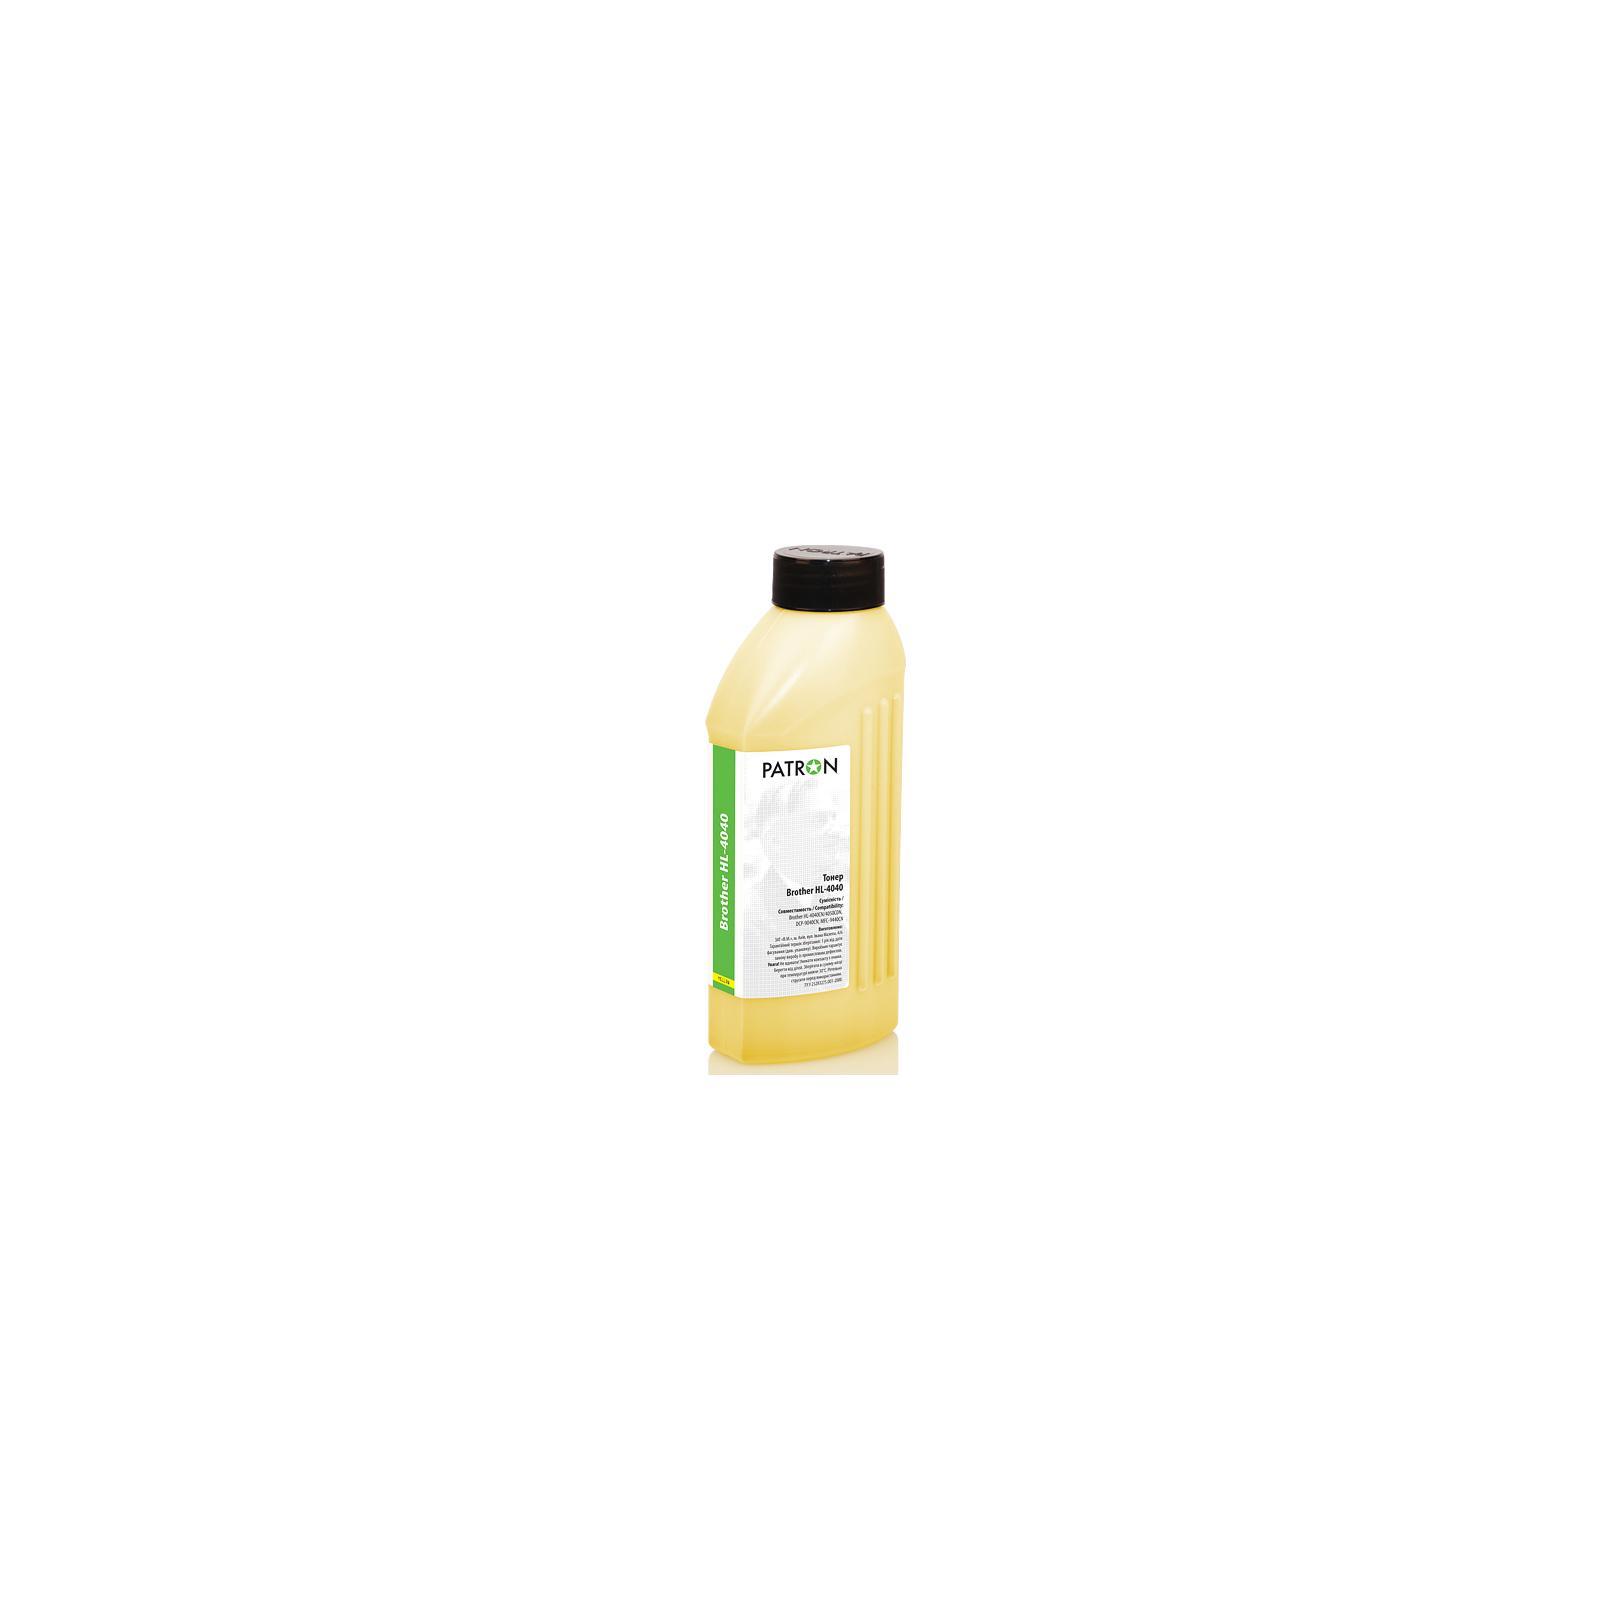 Тонер PATRON Brother HL-4040 YELLOW 120г (T-PN-BHL4040-Y-120)